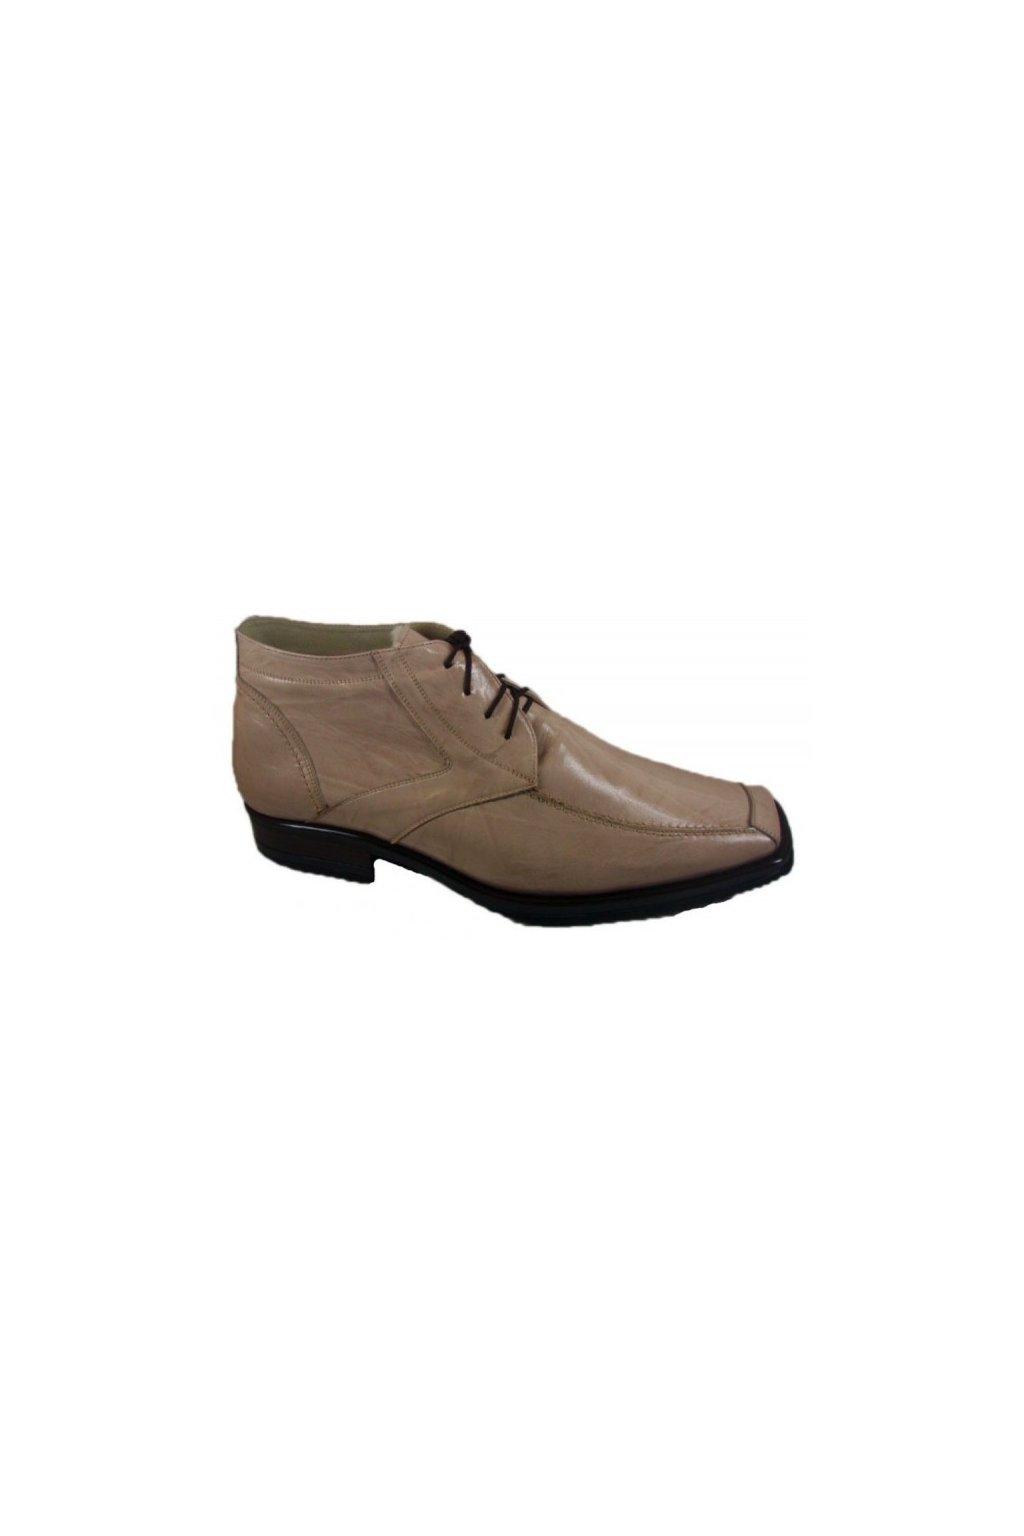 Nadměrná pánská obuv Češvár MZ kožich béžová